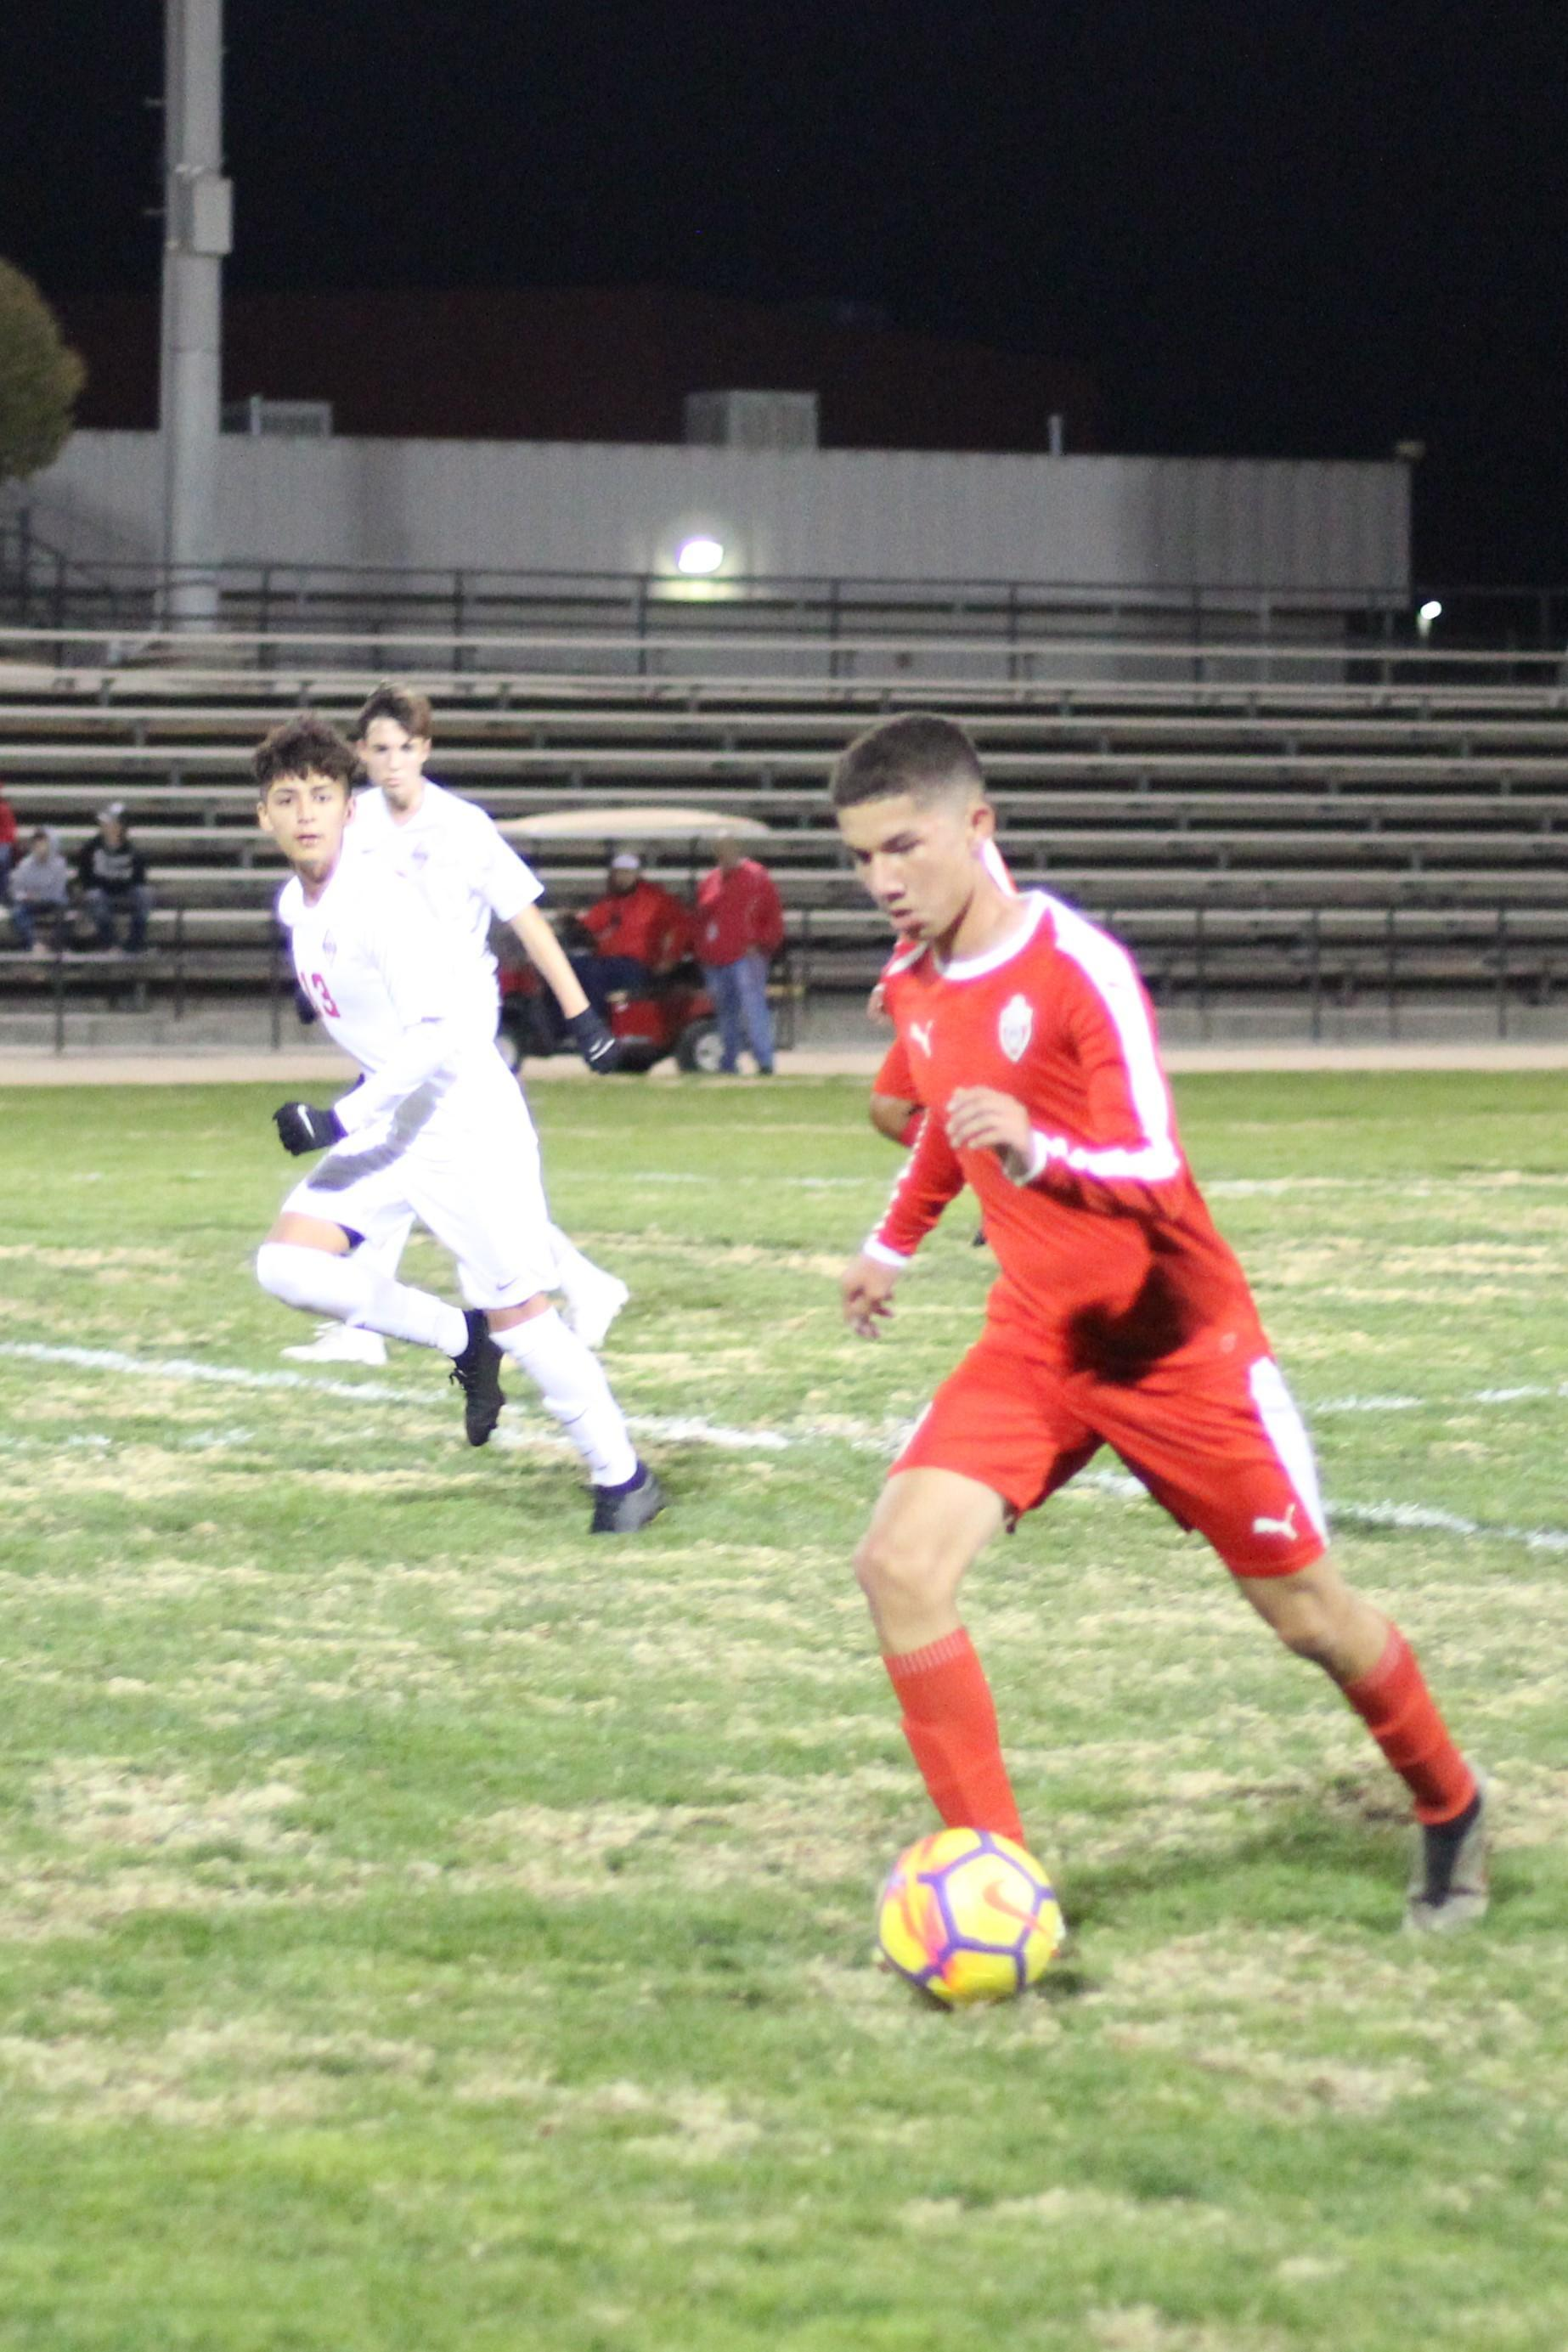 Jose Renteria running the ball down the field